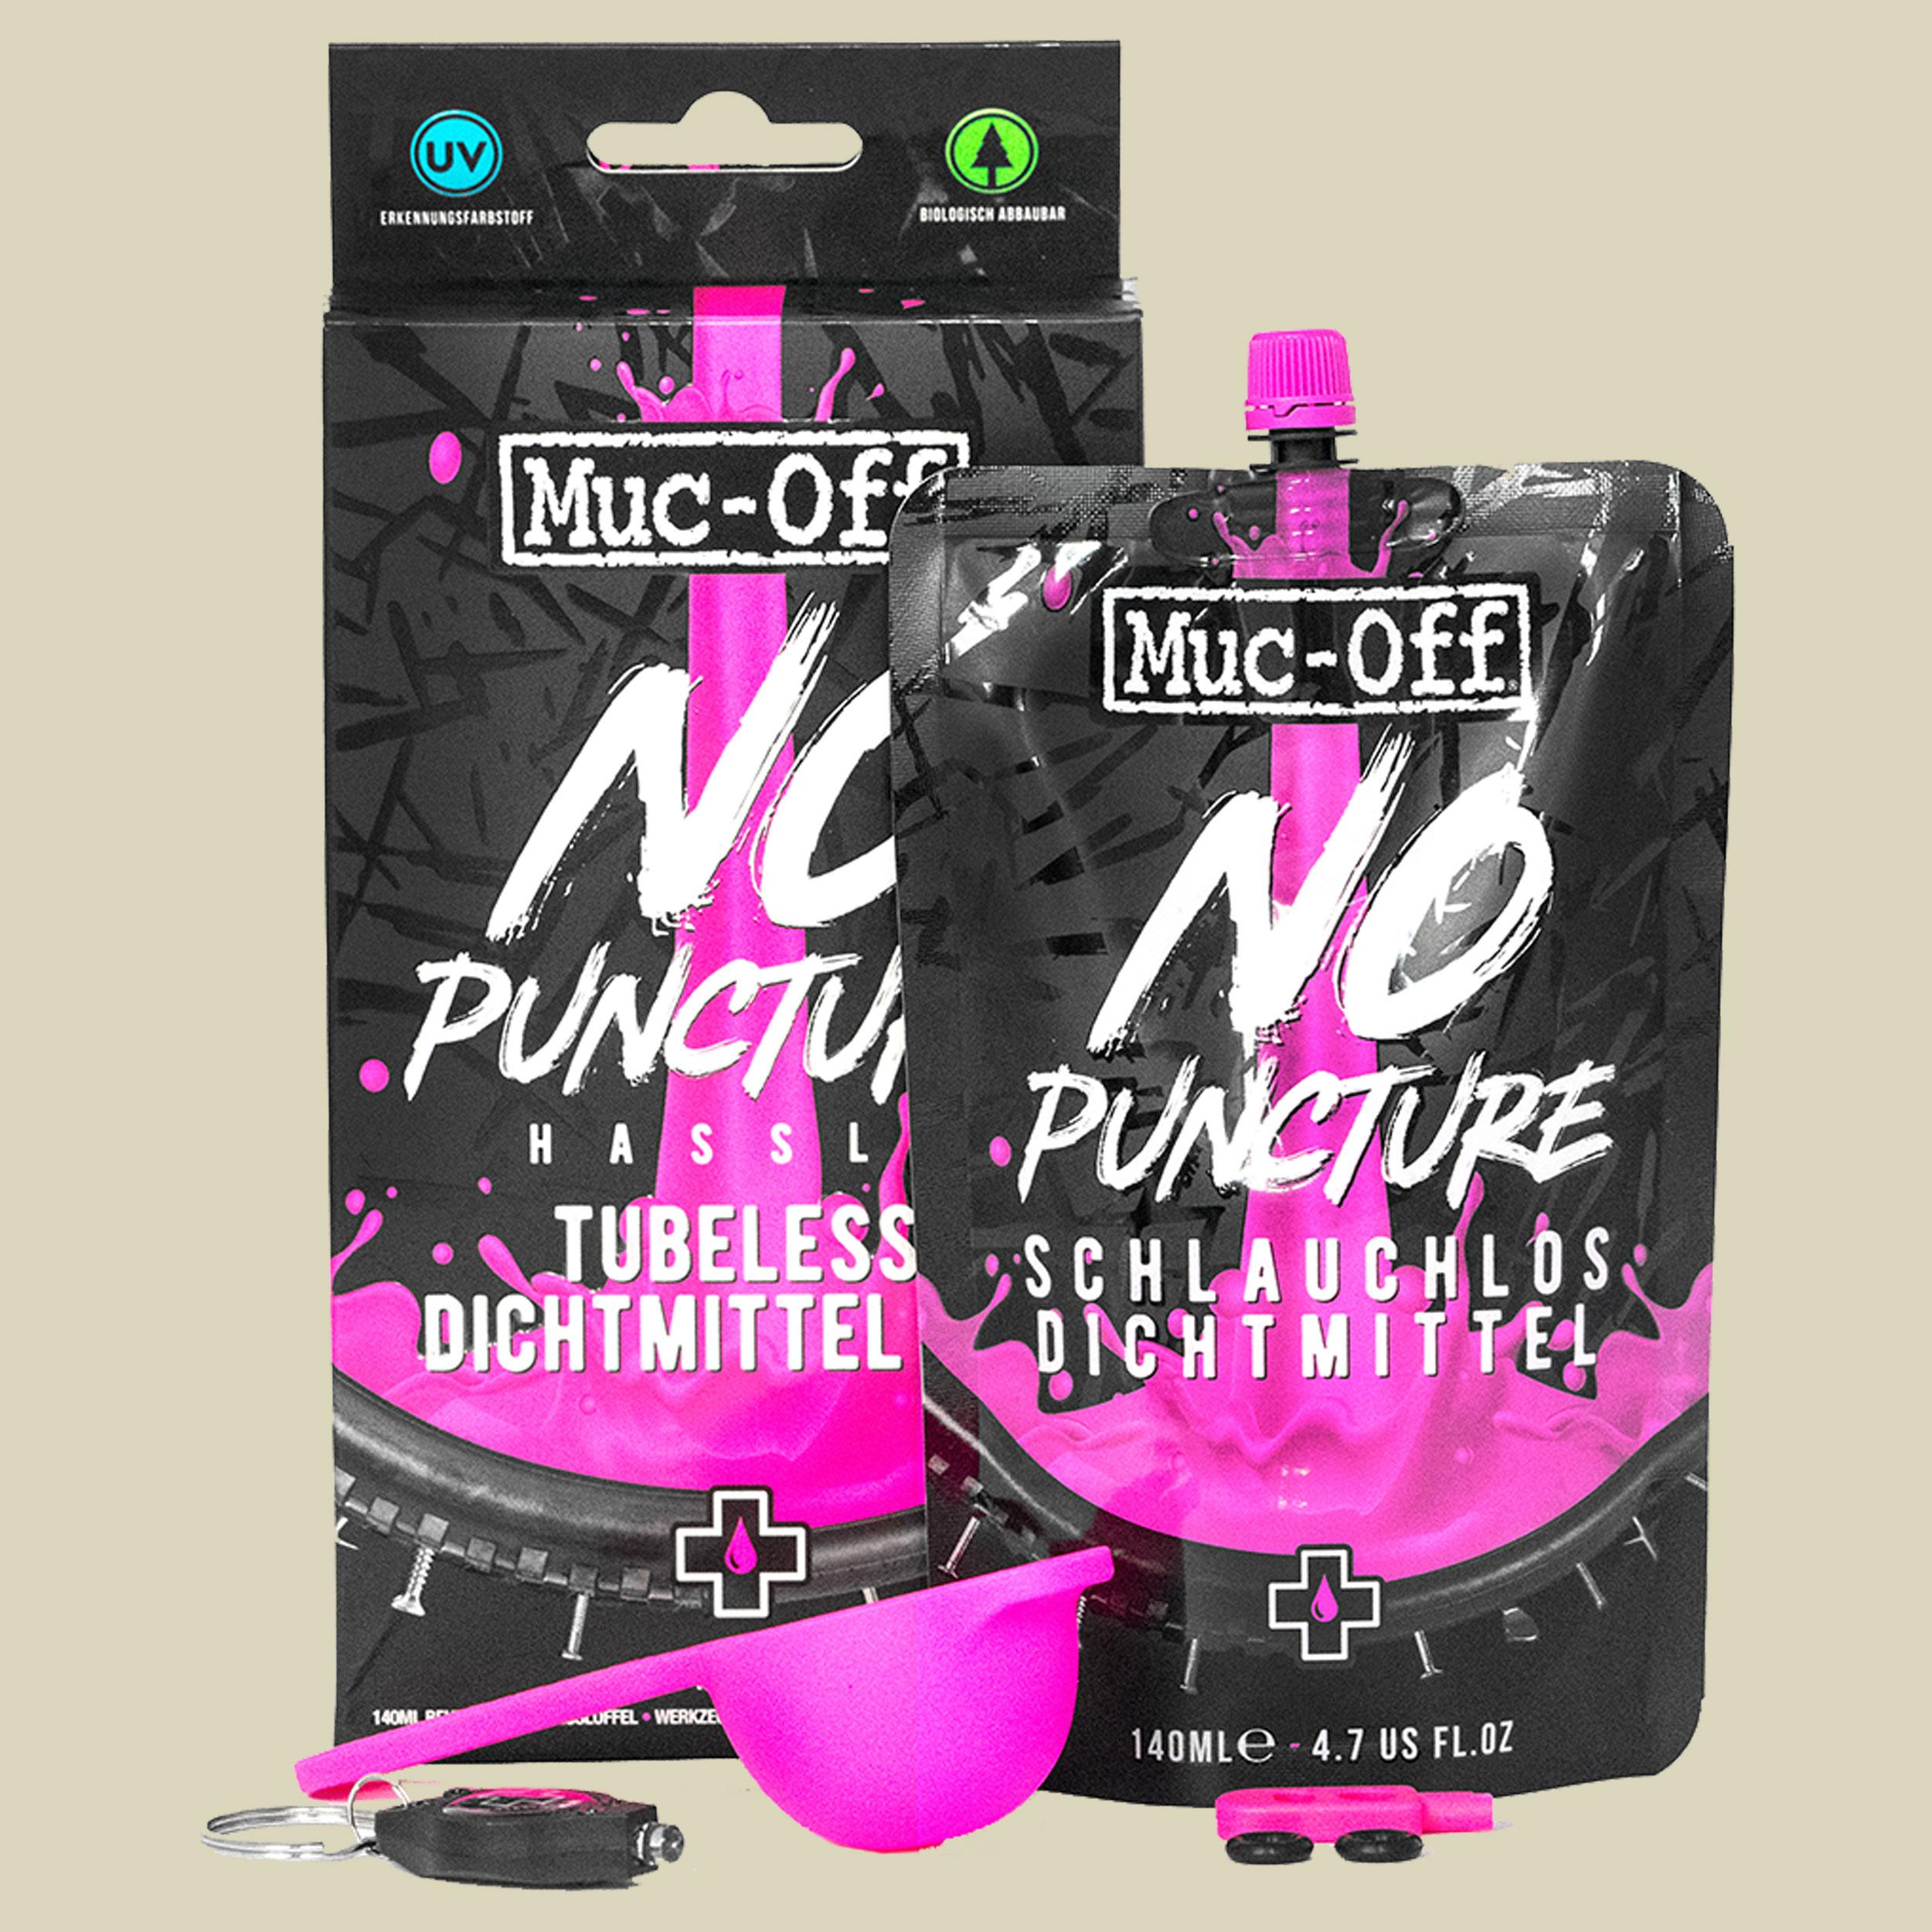 Muc-Off No Puncture Hassle Tubeless Dichtmittel Kit Reifendichtmittel